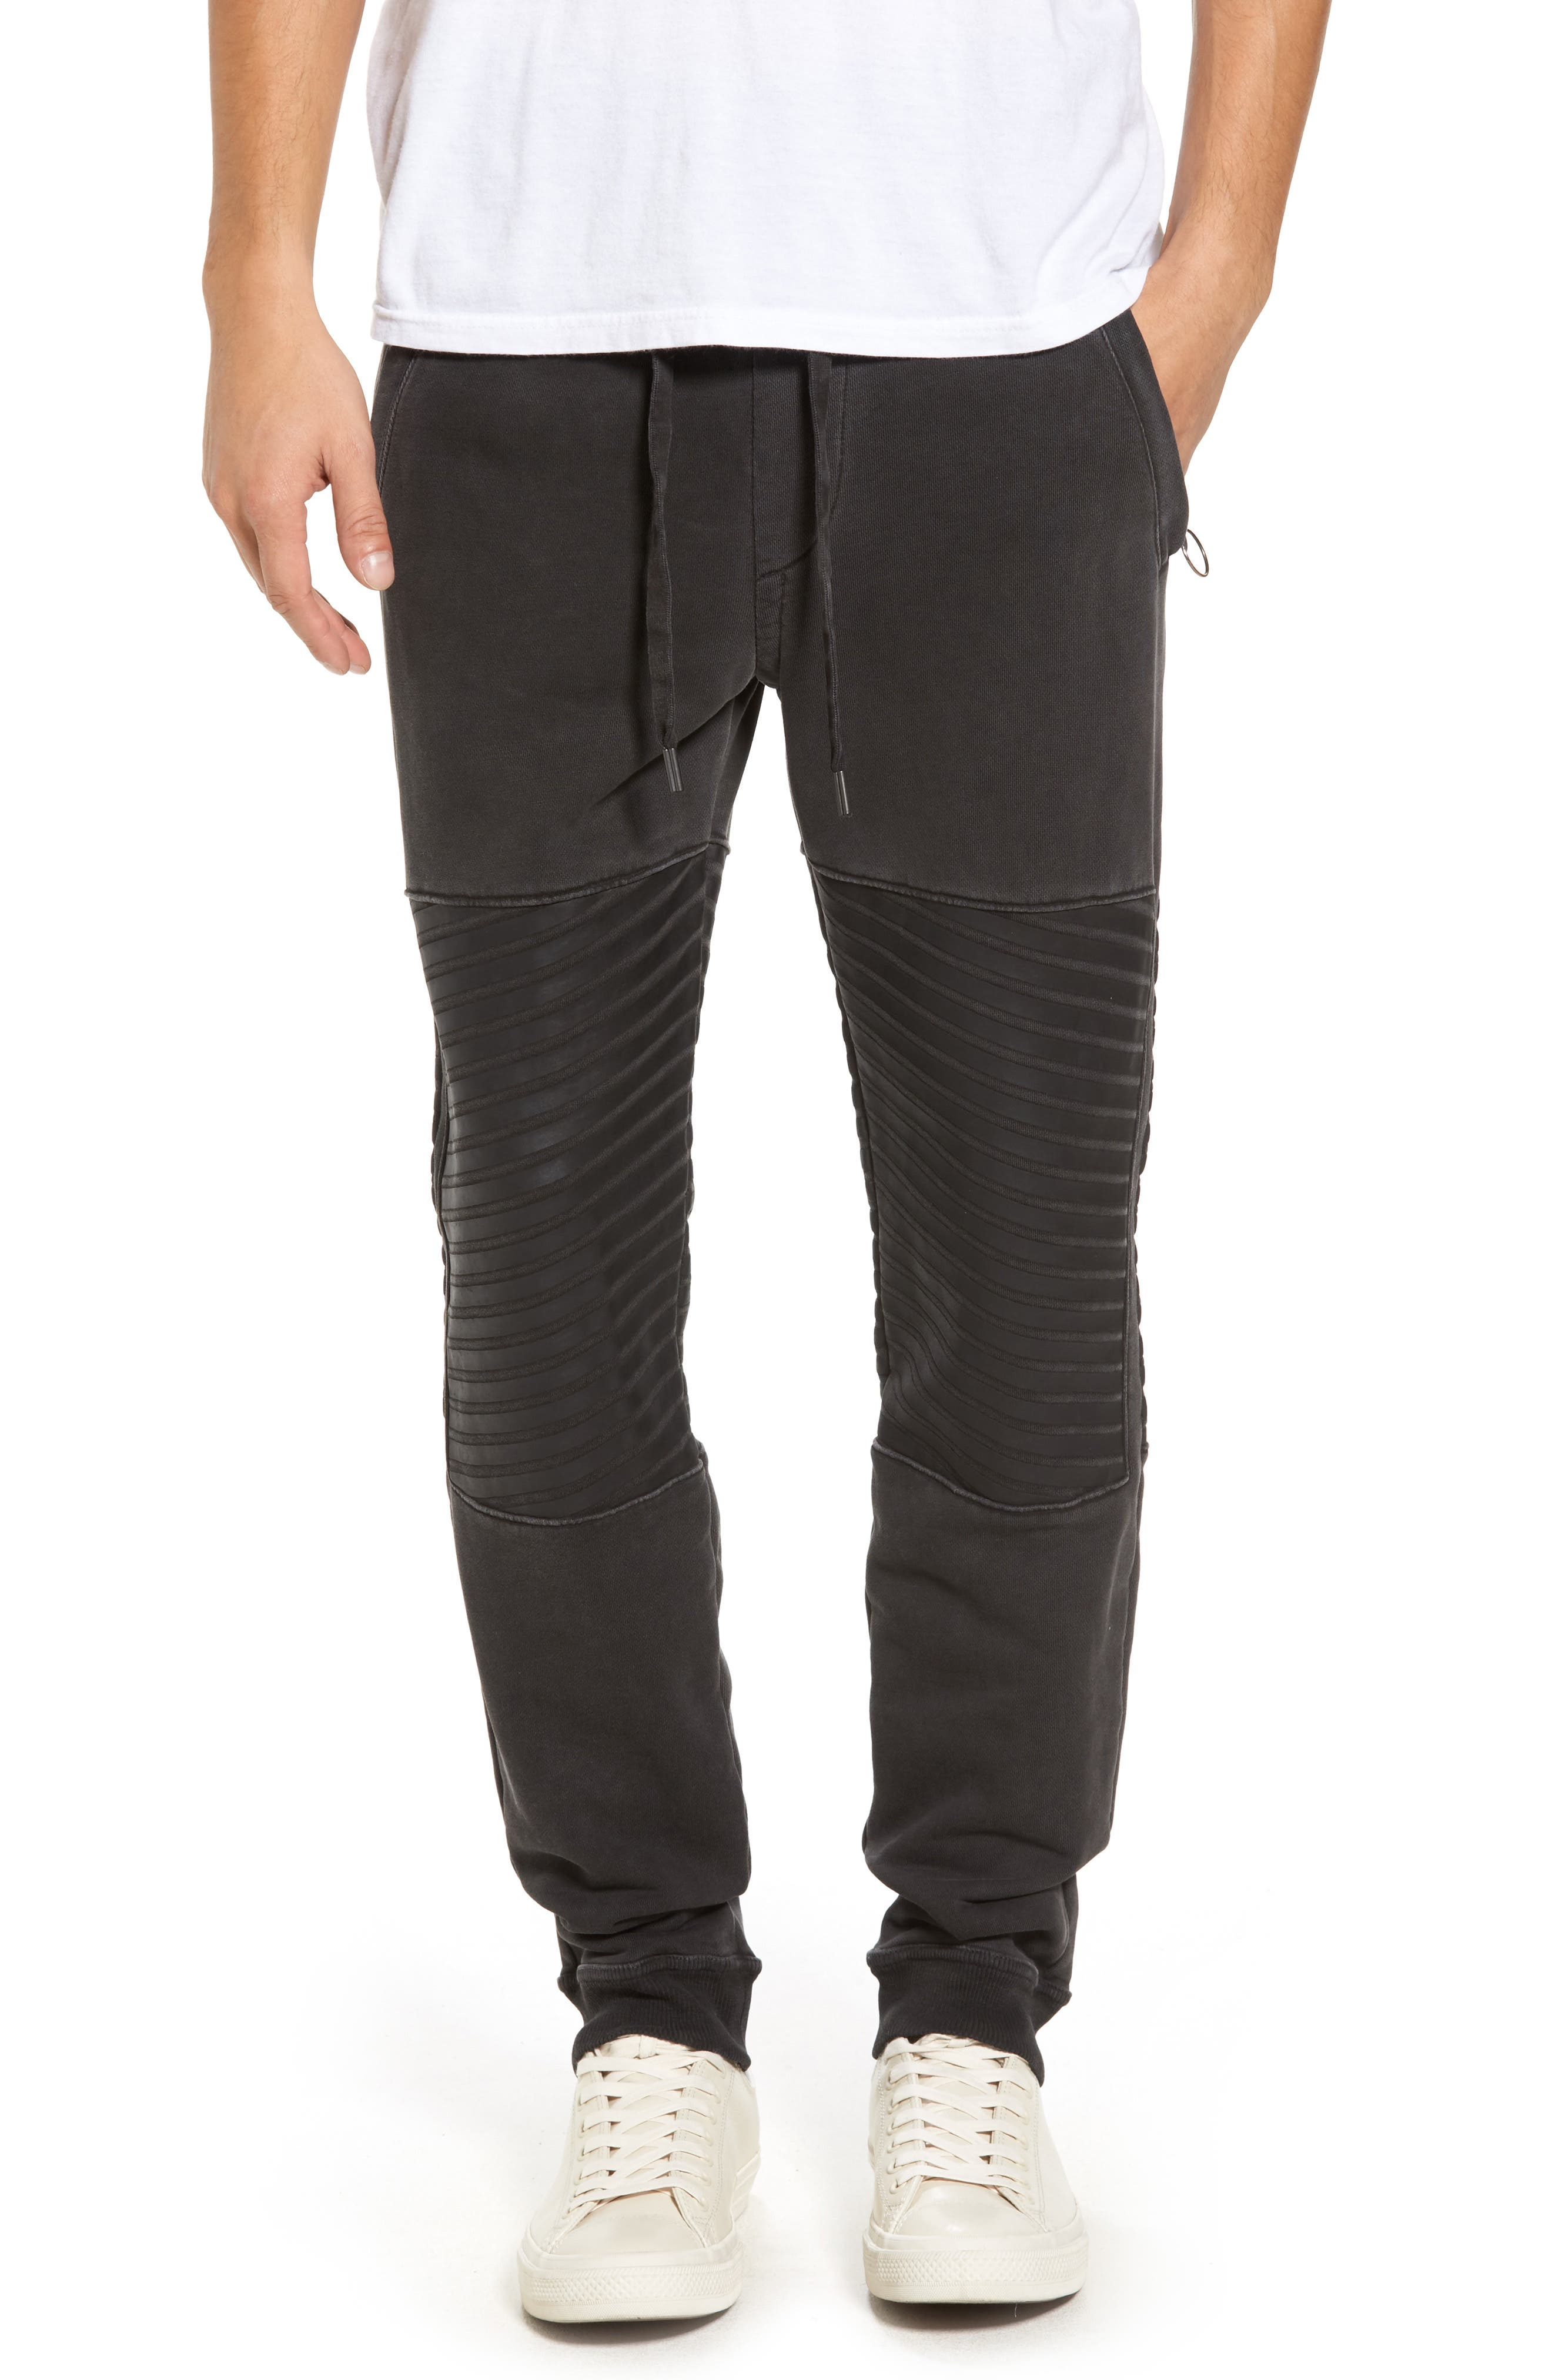 Alternate Image 1 Selected - True Religion Brand Jeans Moto Sweatpants